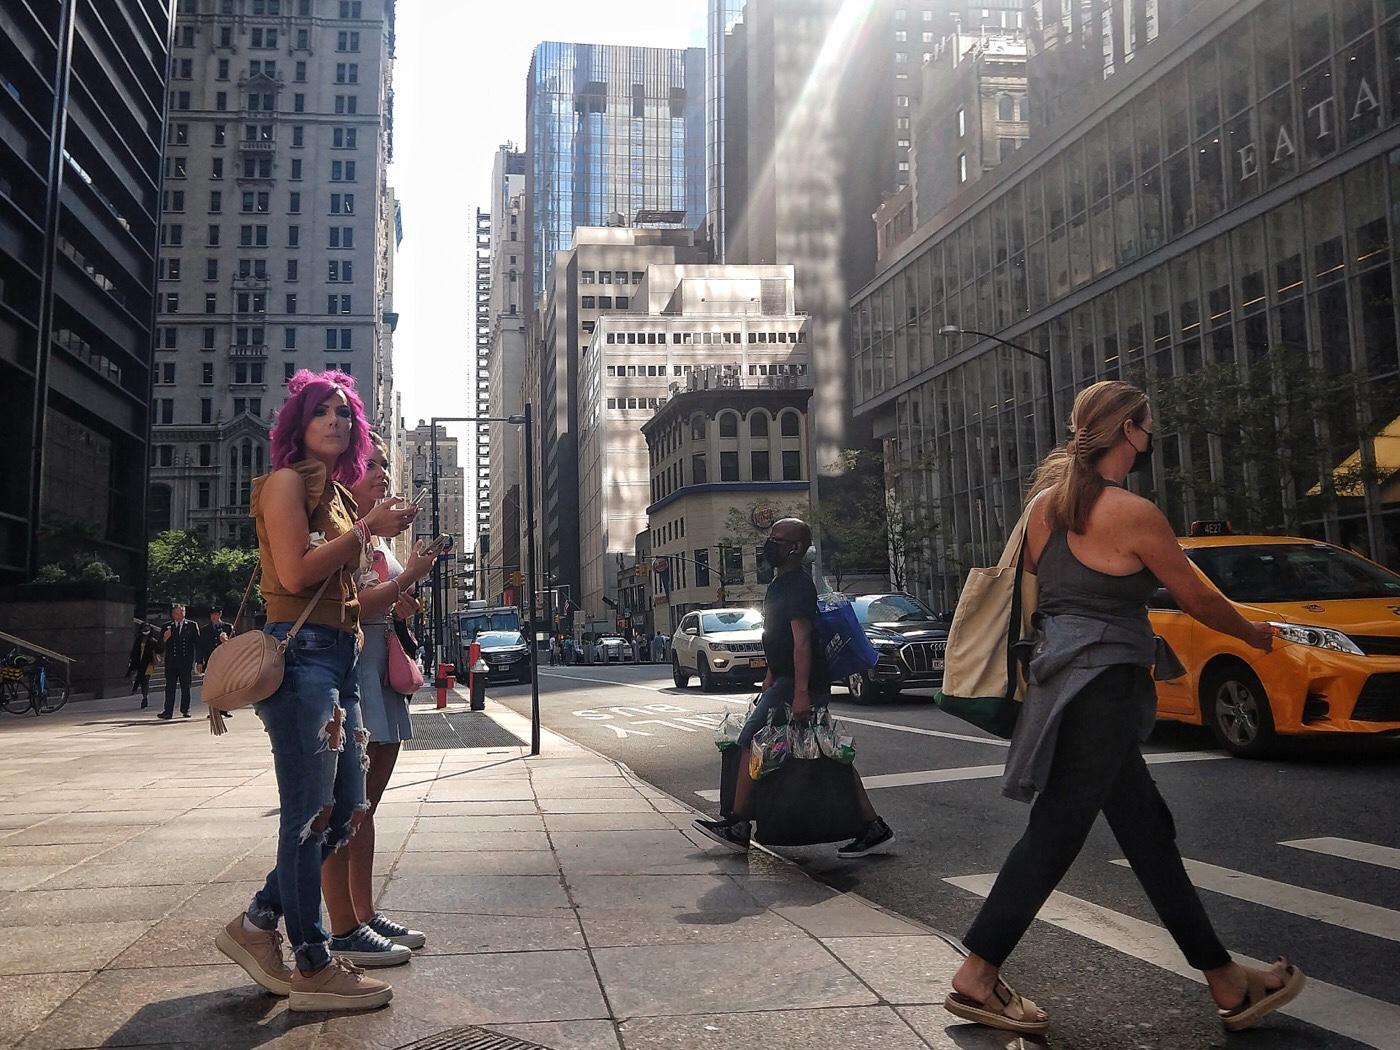 New York, Financial District, Church Street and Liberty Street